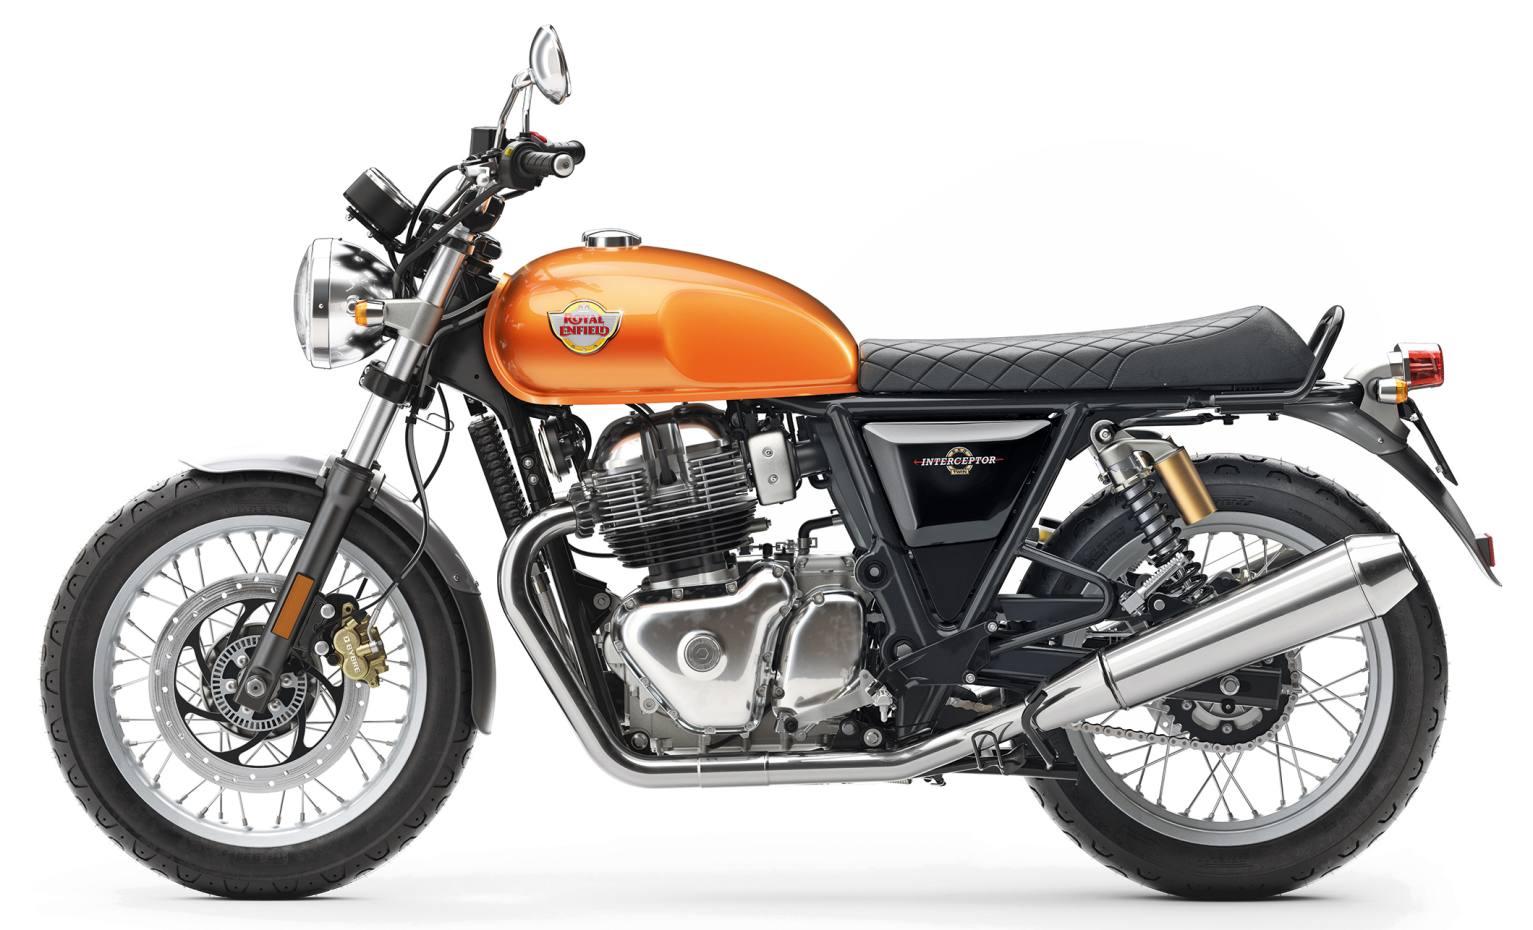 Royal Enfield's new Interceptor street bike, £5,995